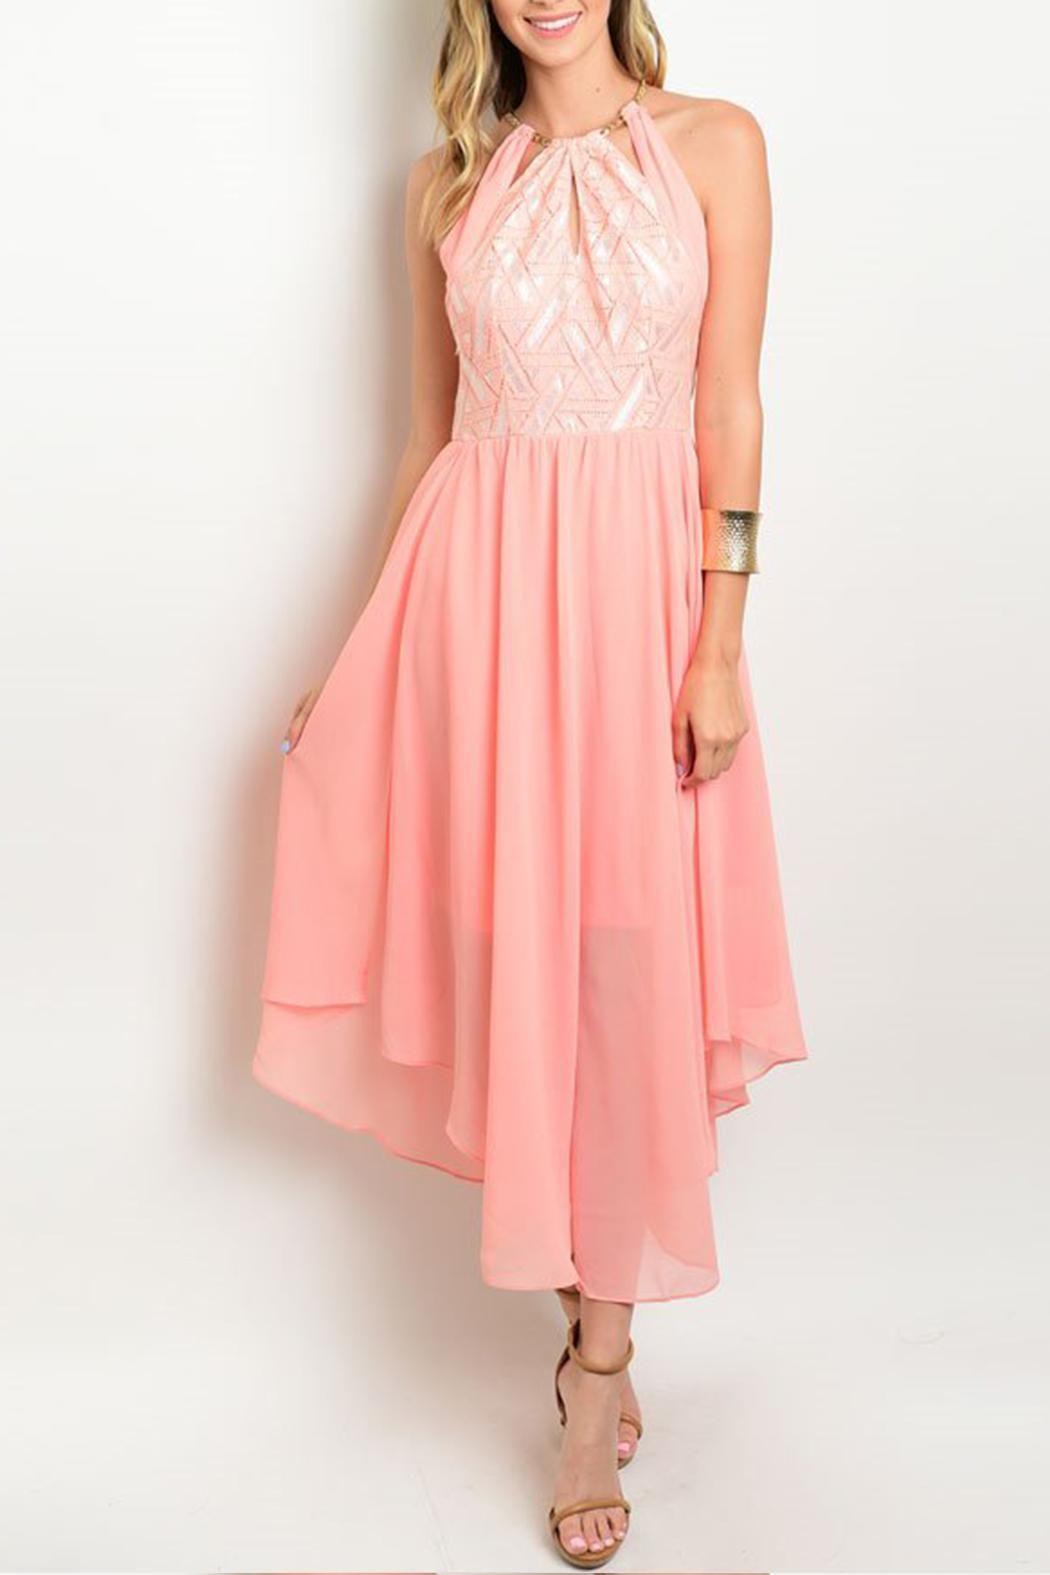 Soieblu Blush Dress